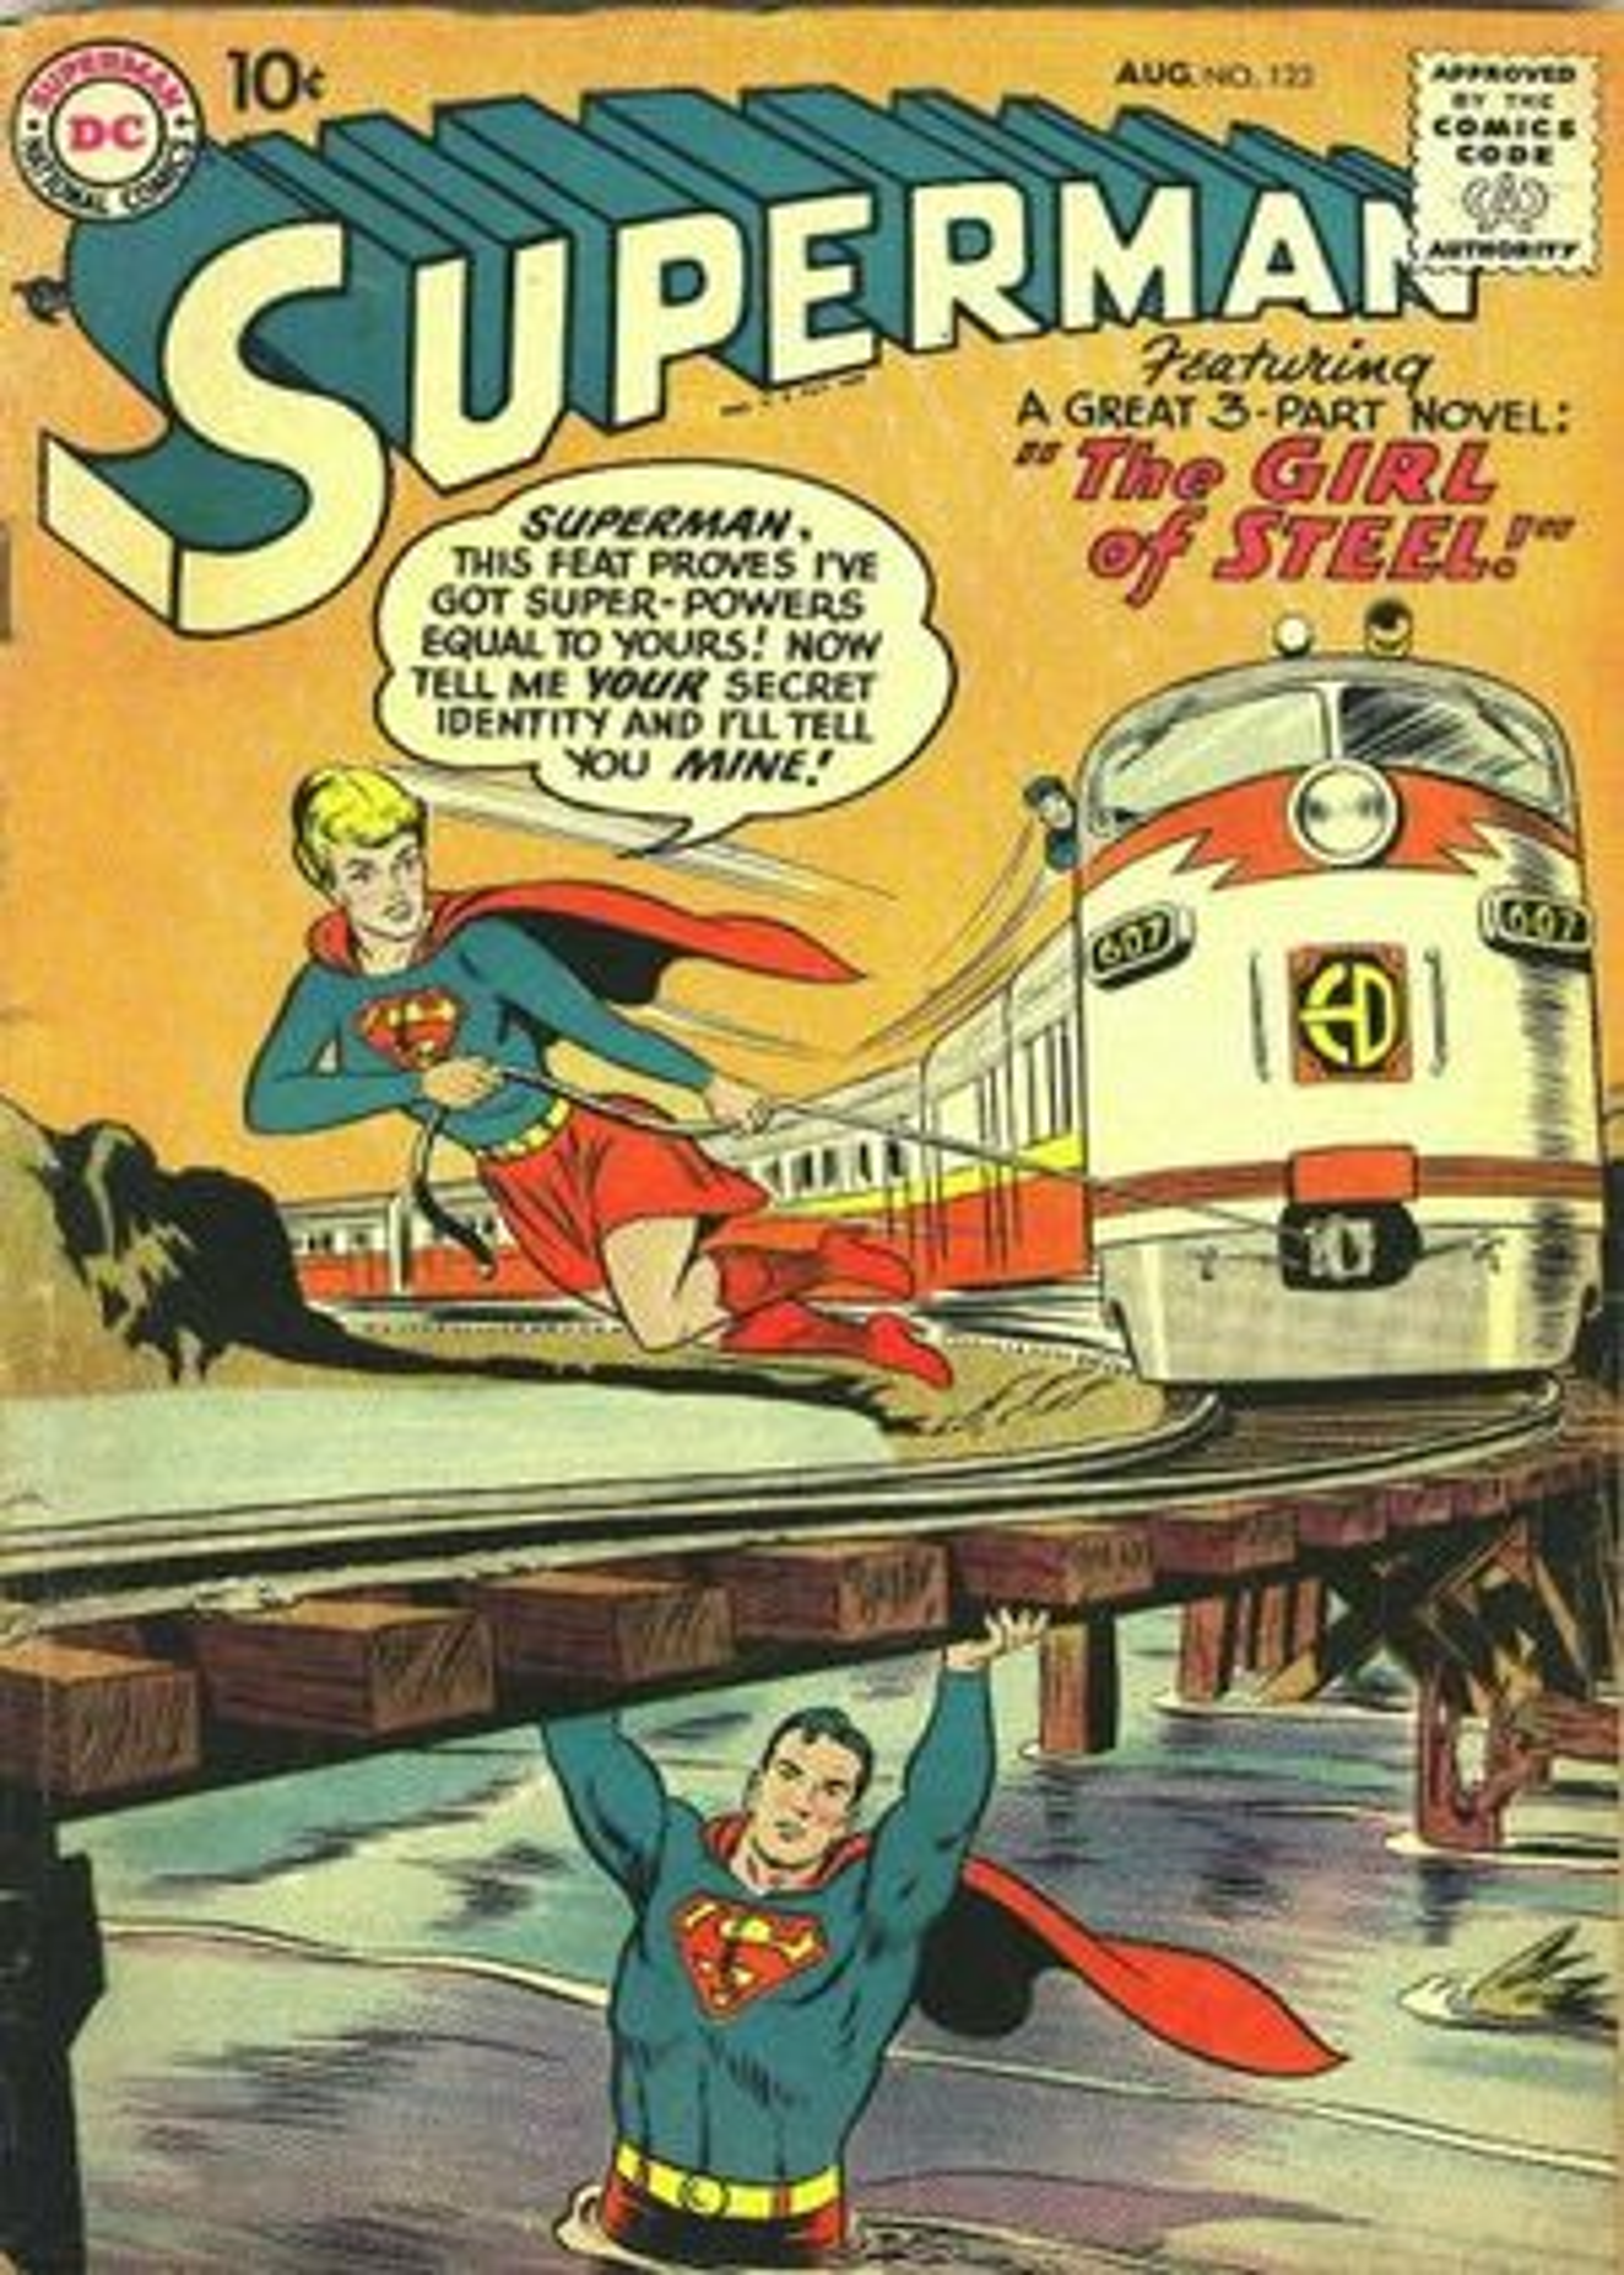 File:Superman Vol 1 123.jpg